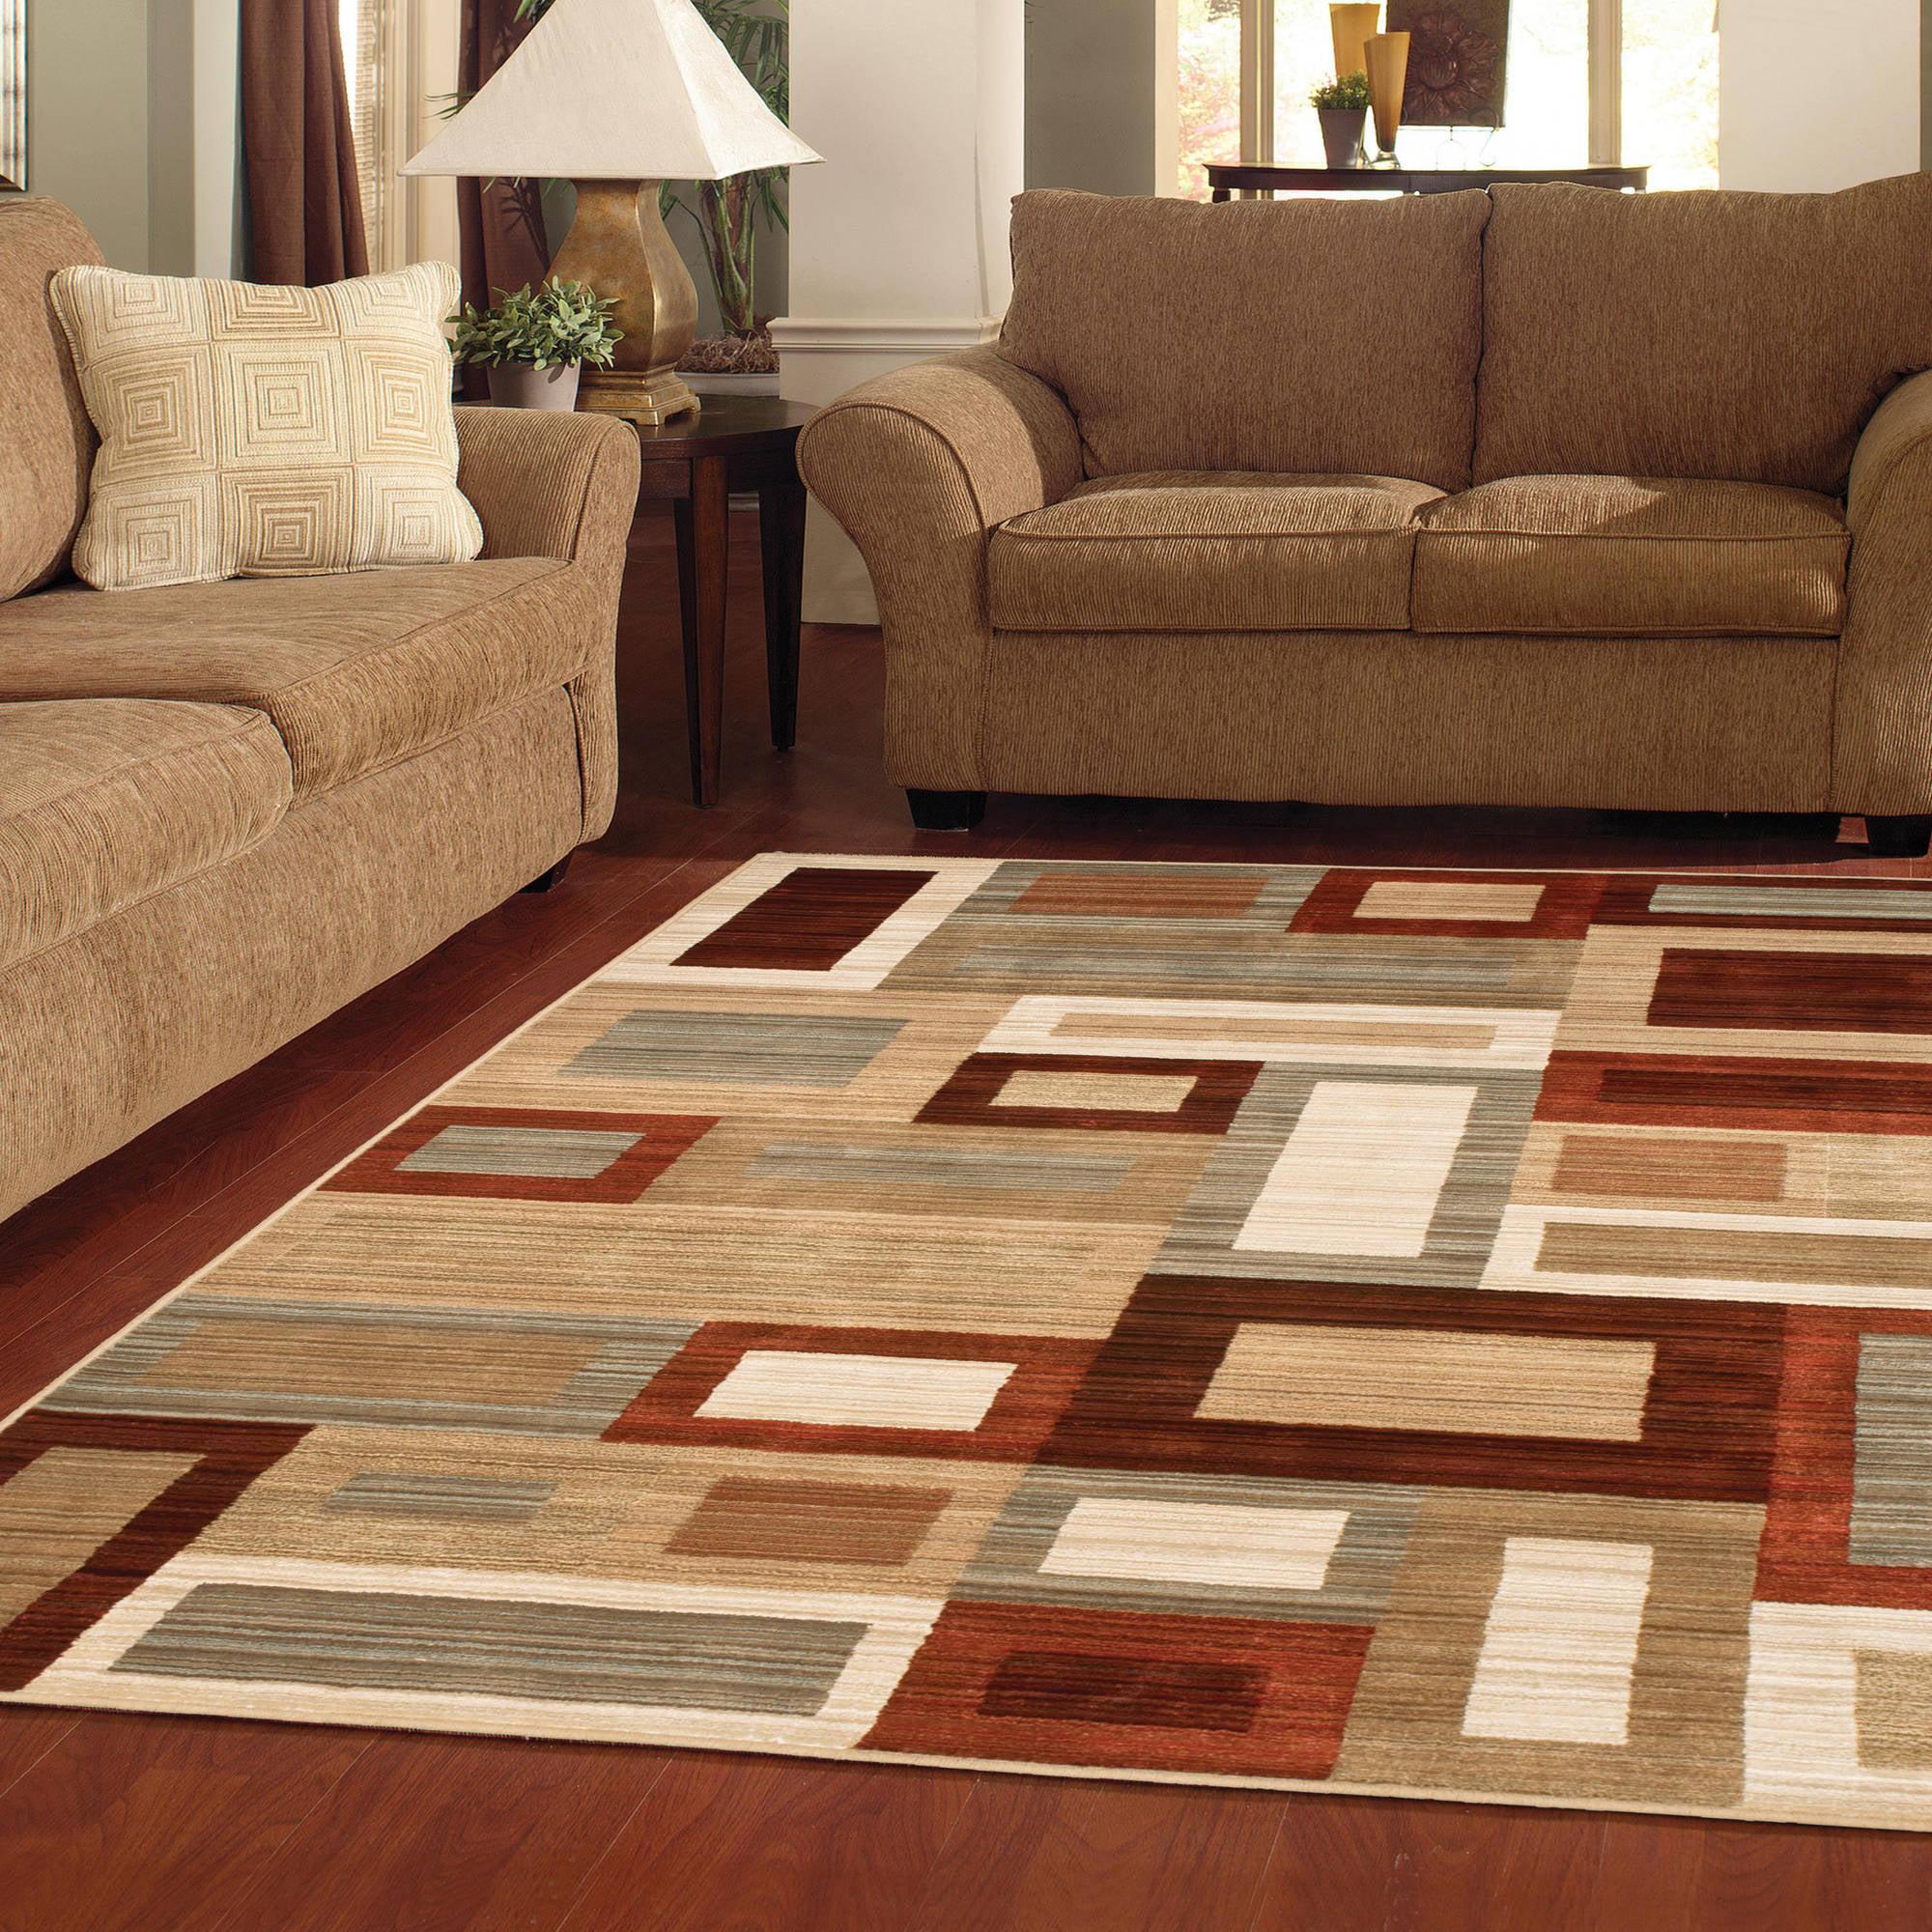 Brilliant 80 Carpet Garden Decorating Design Inspiration Cubicle